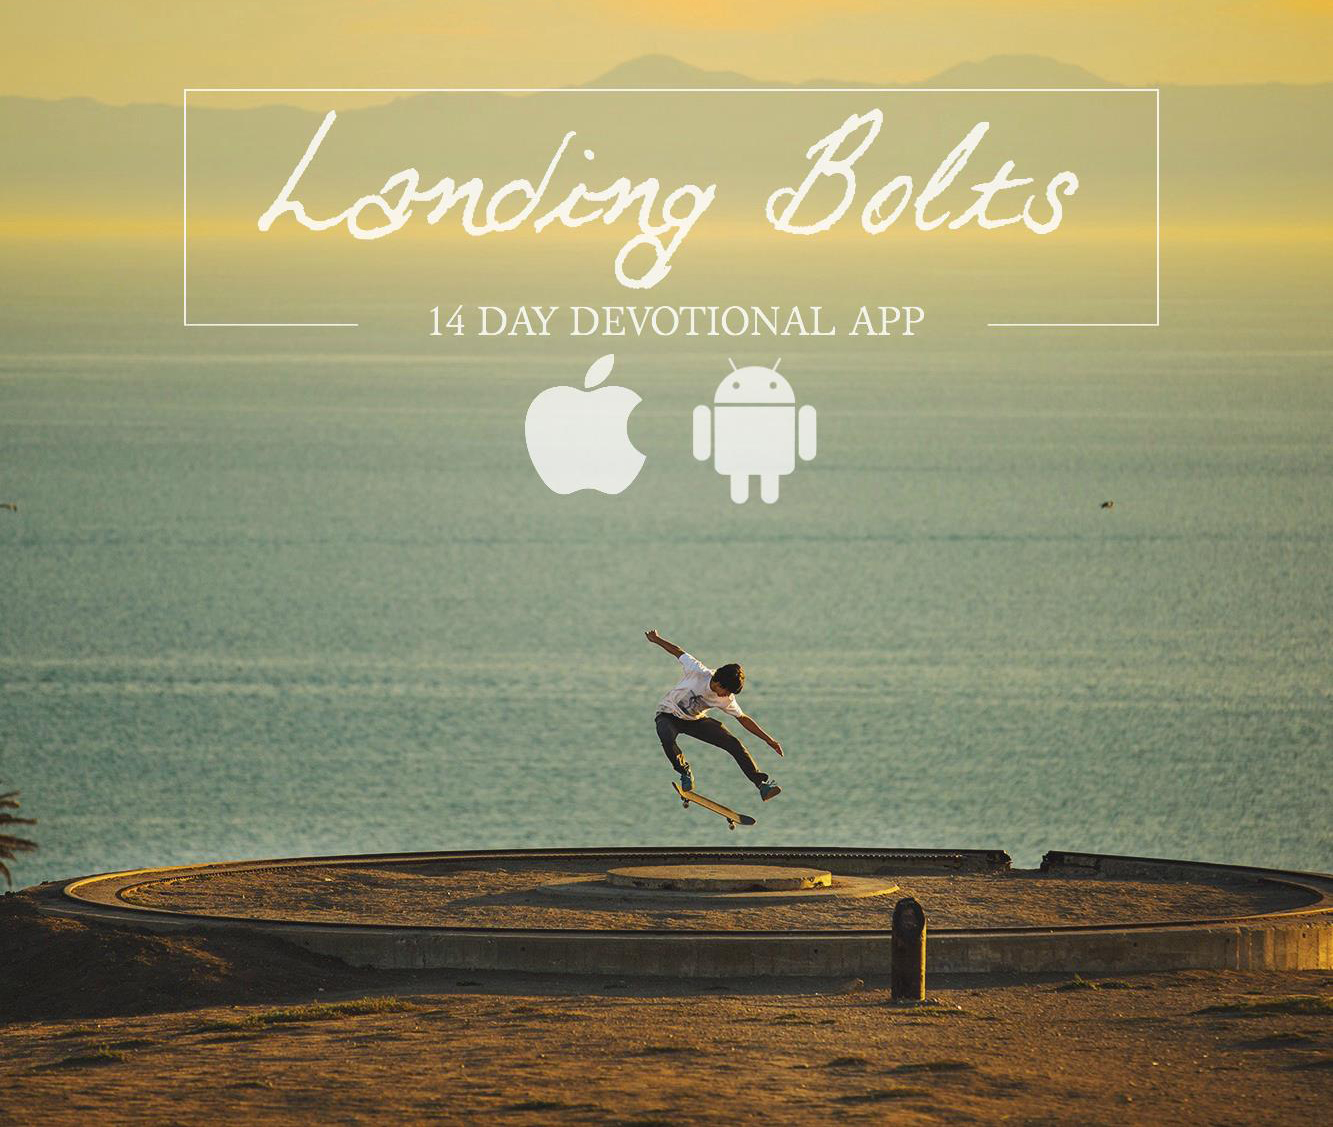 LandingBolts